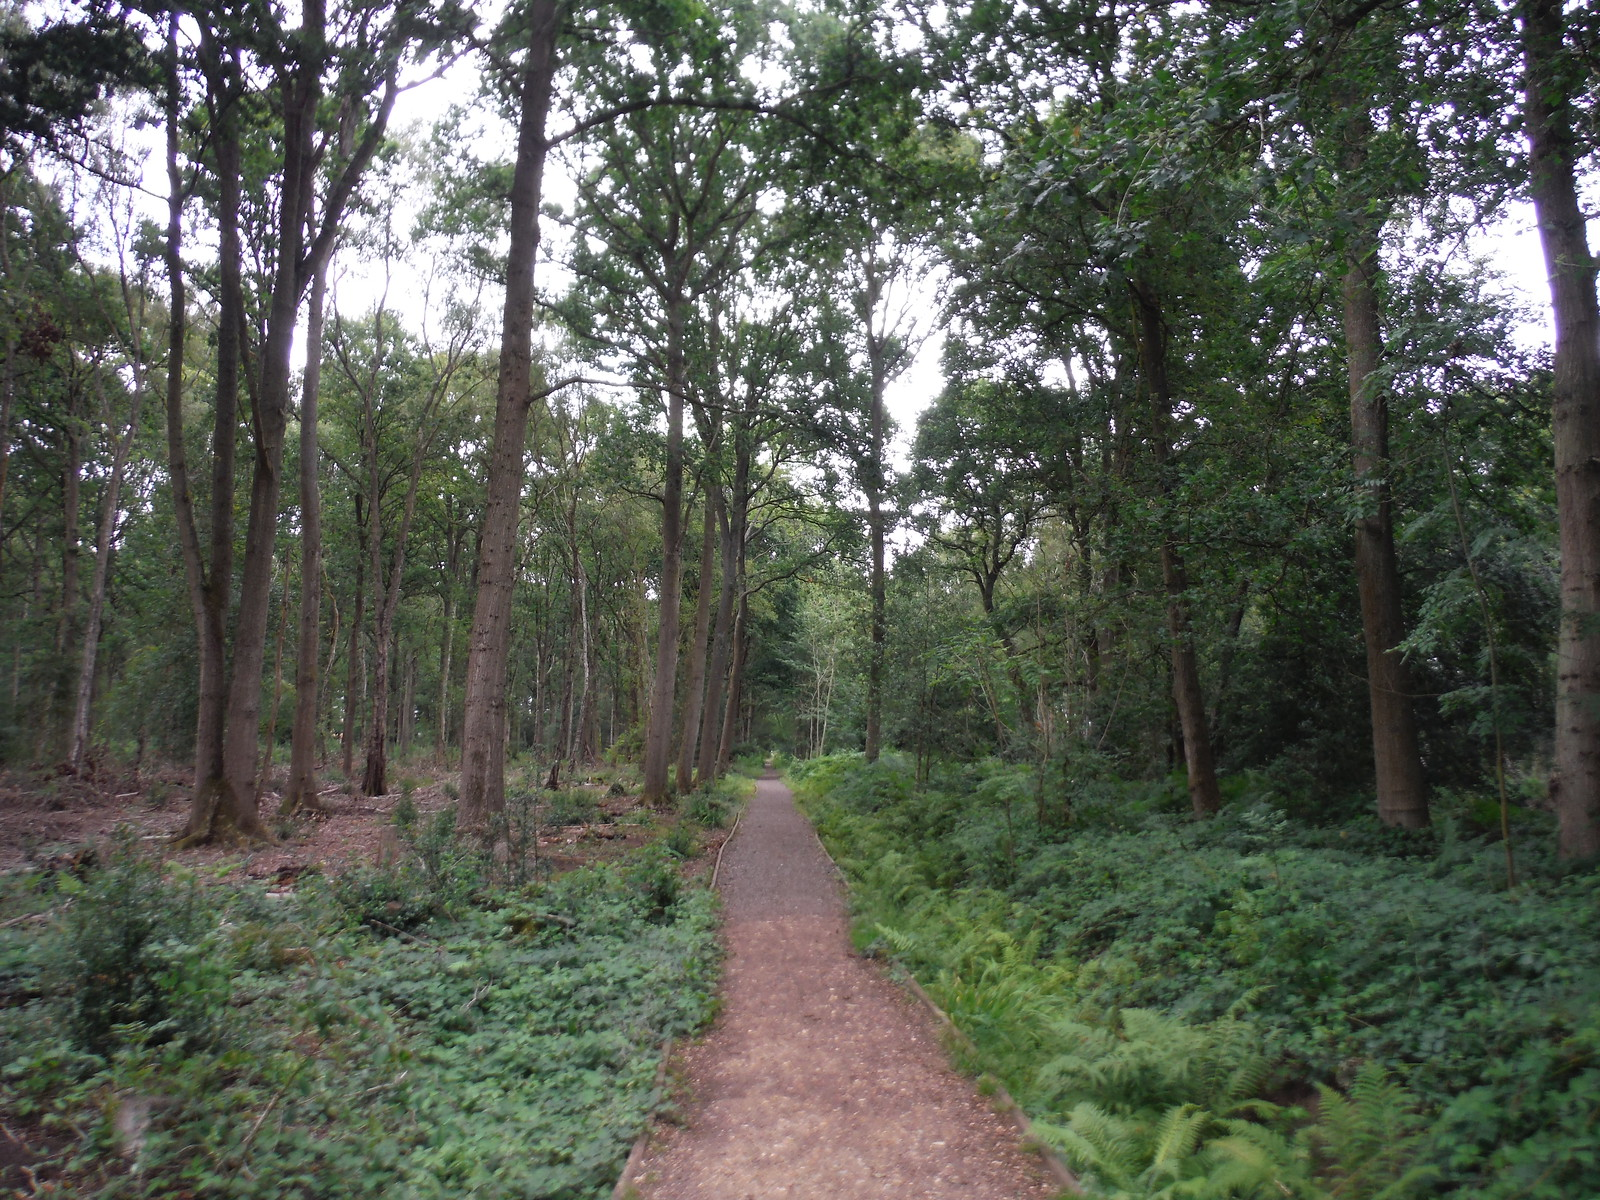 Rifle Range Path, West End Common Rifle Range SWC Short Walk 17 - Oxshott Heath, Esher and West End Commons